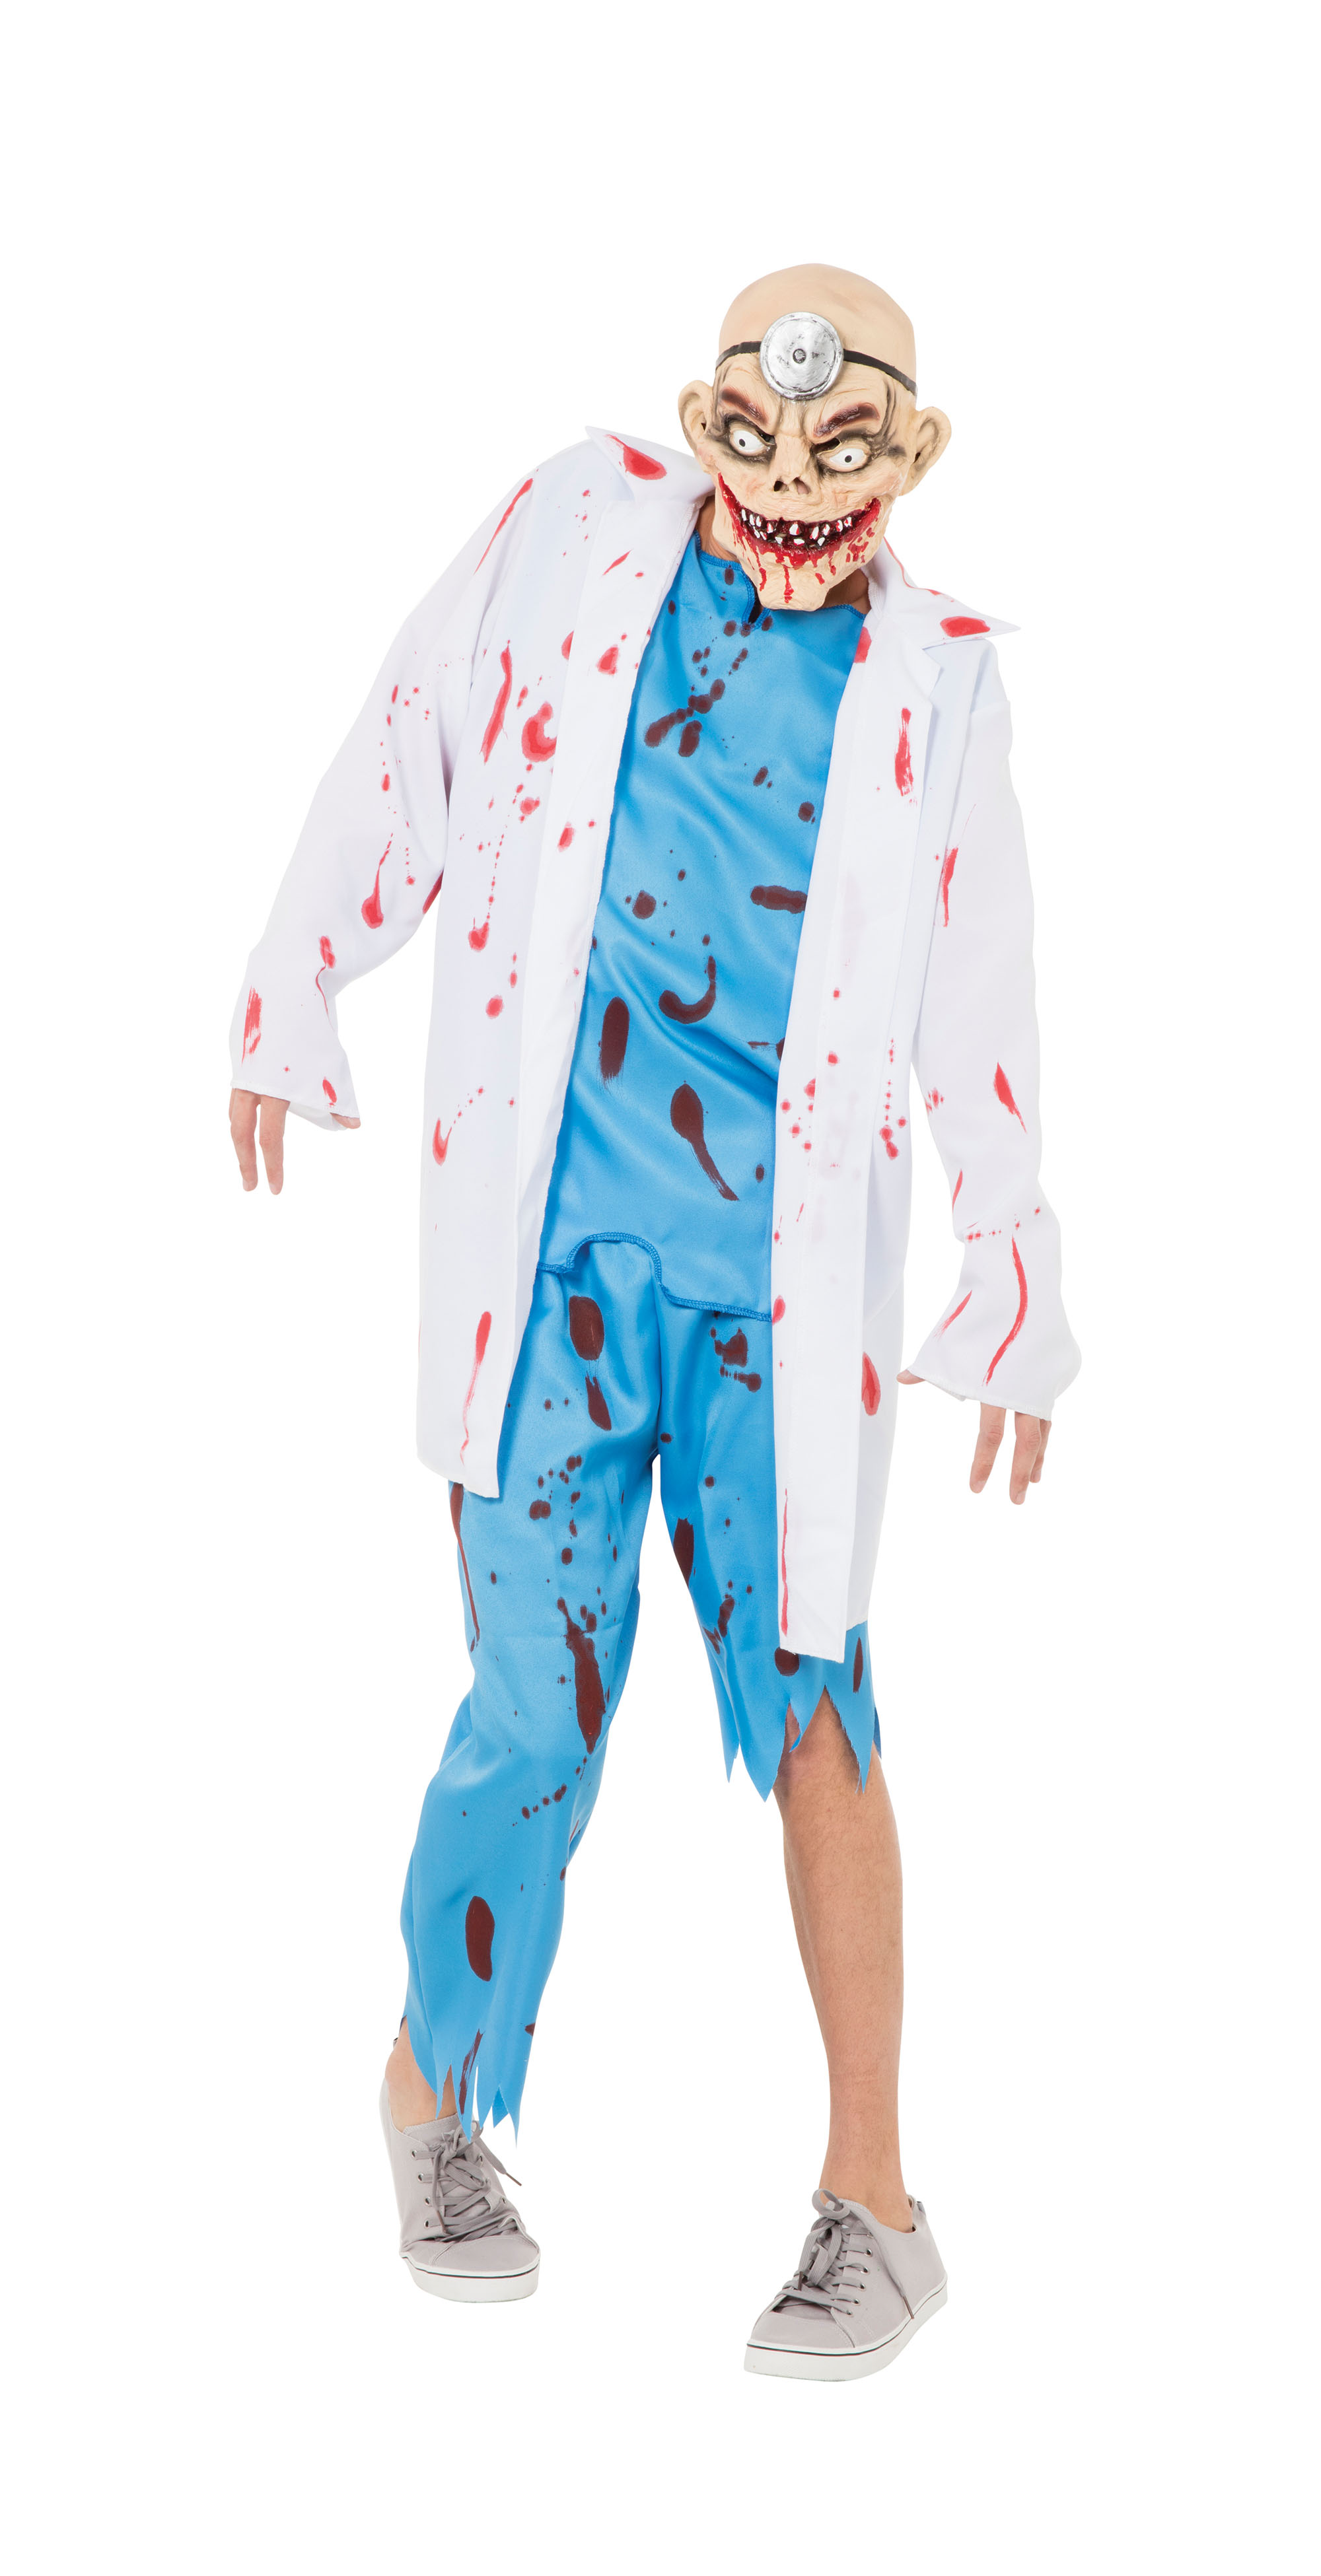 046e9e86fc9 Doctors & Nurses Costumes | Mega Fancy Dress